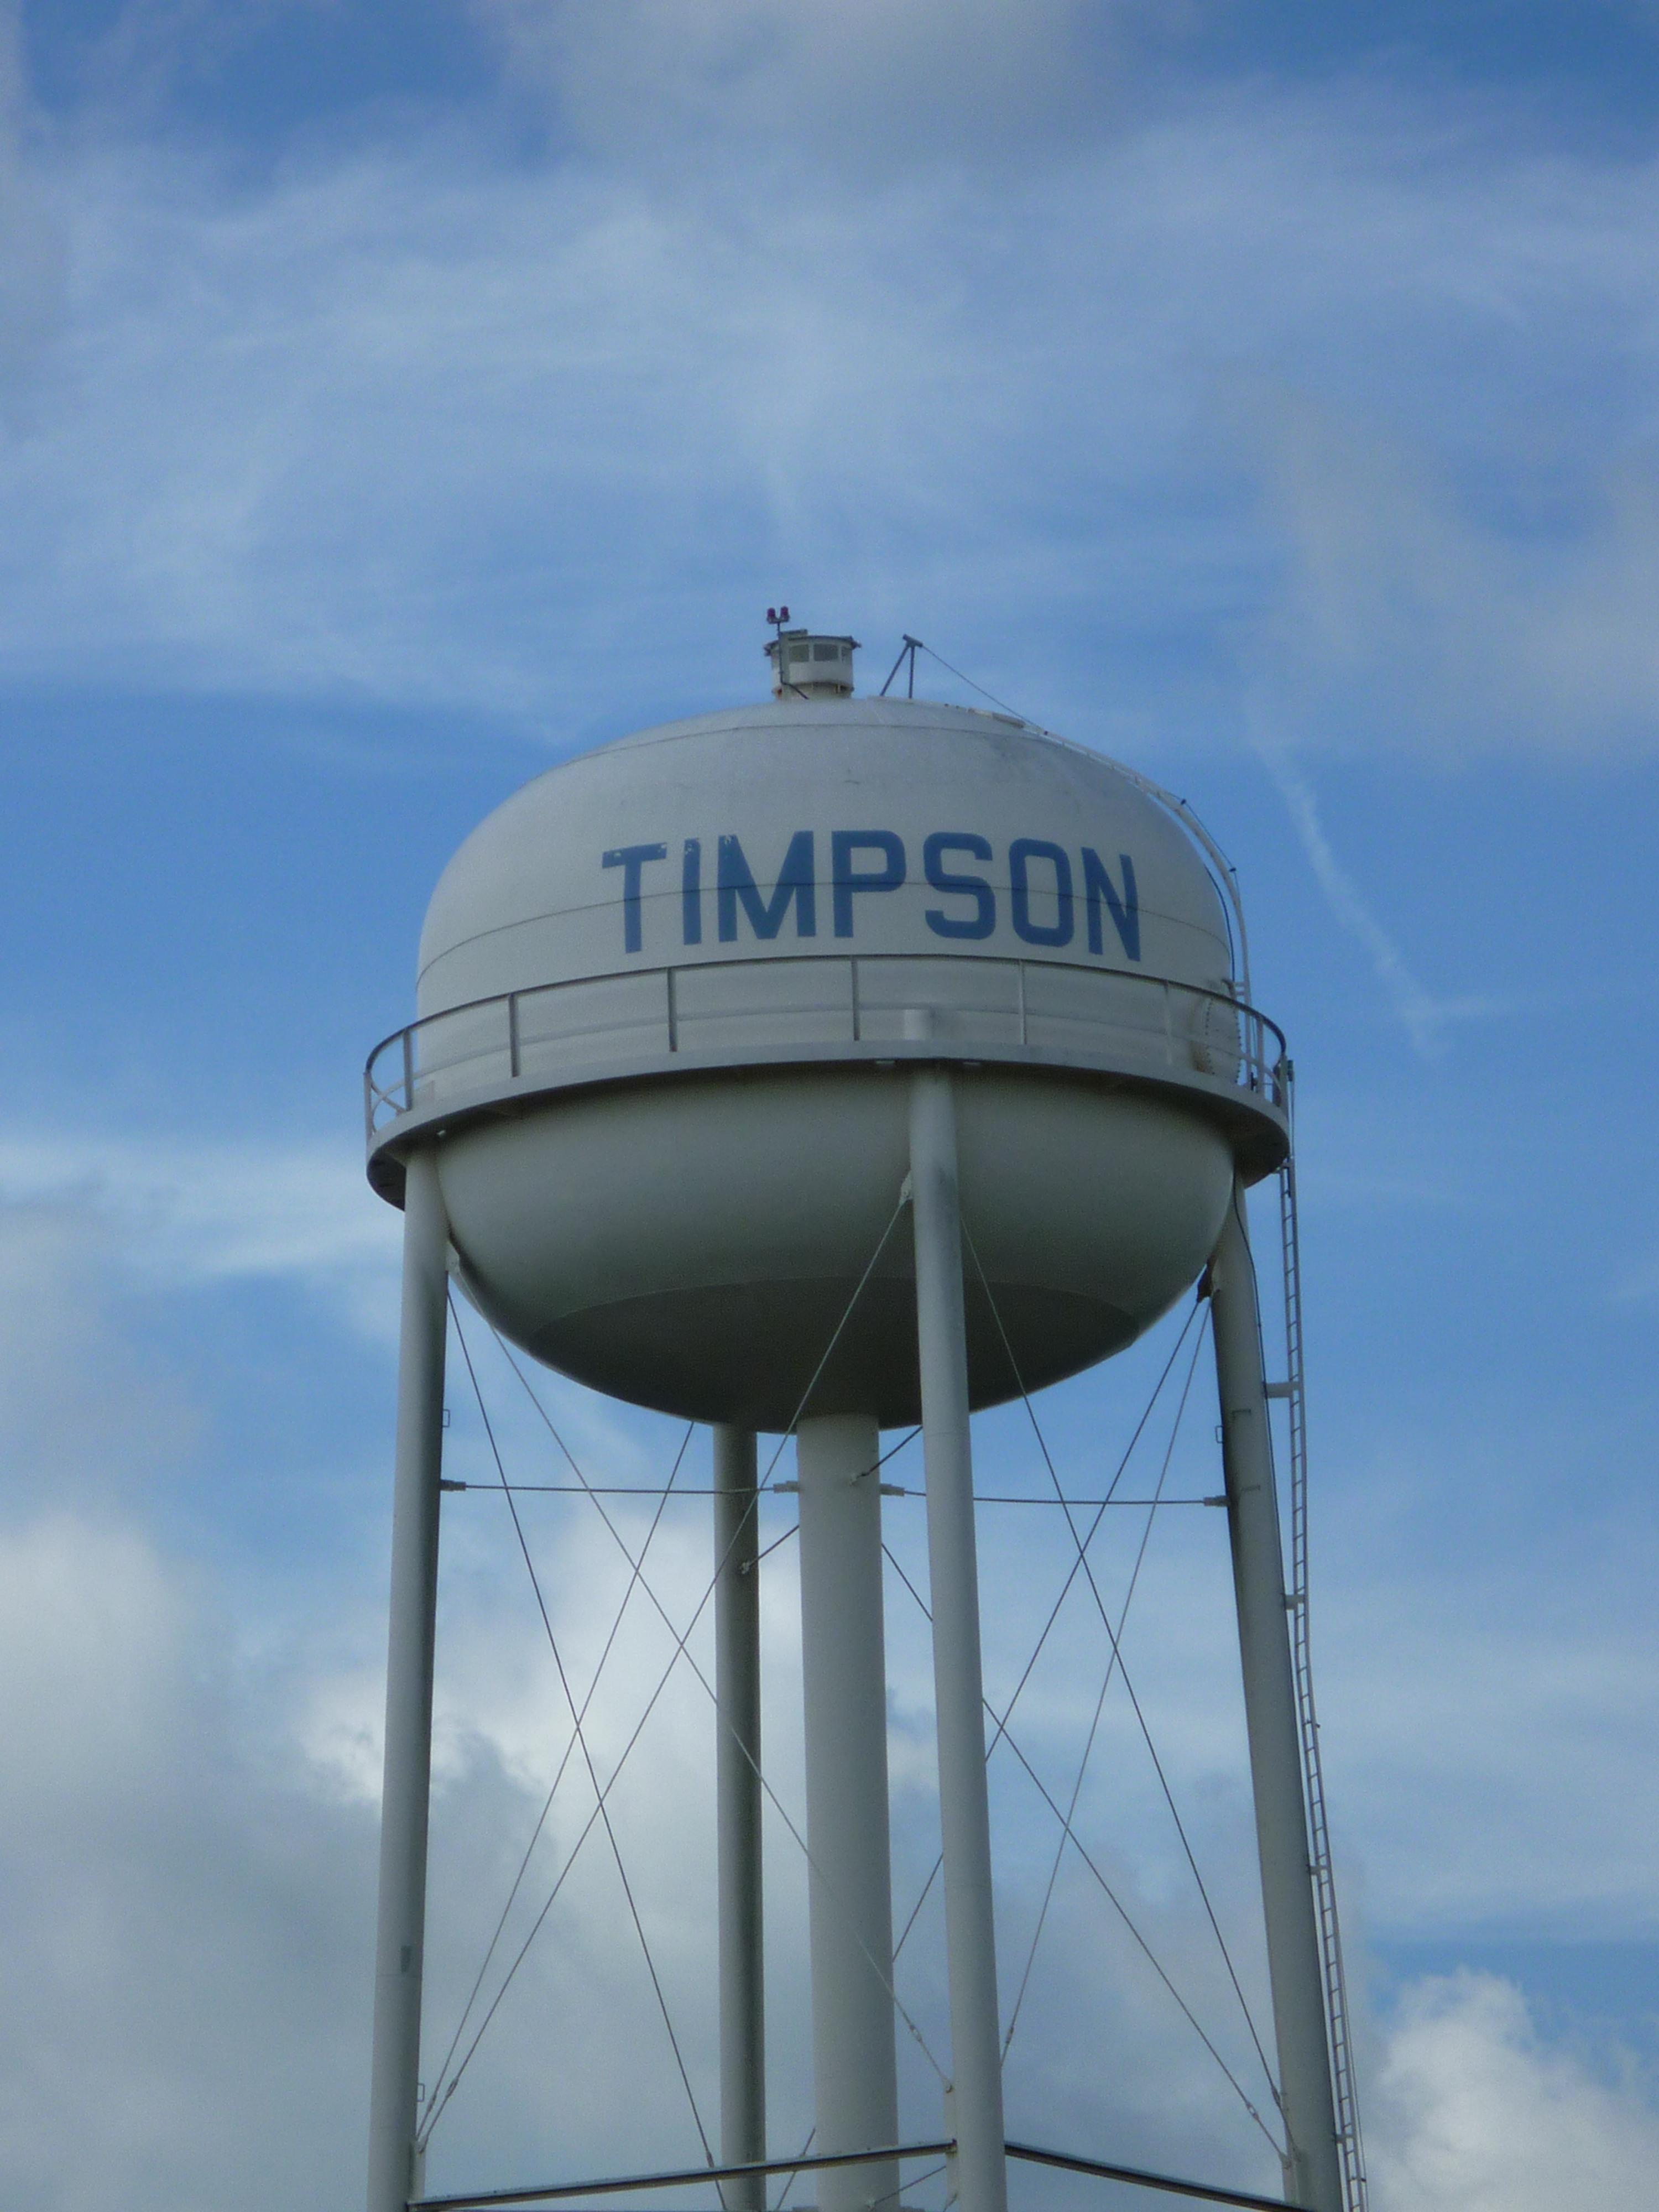 تیمسون، تگزاس